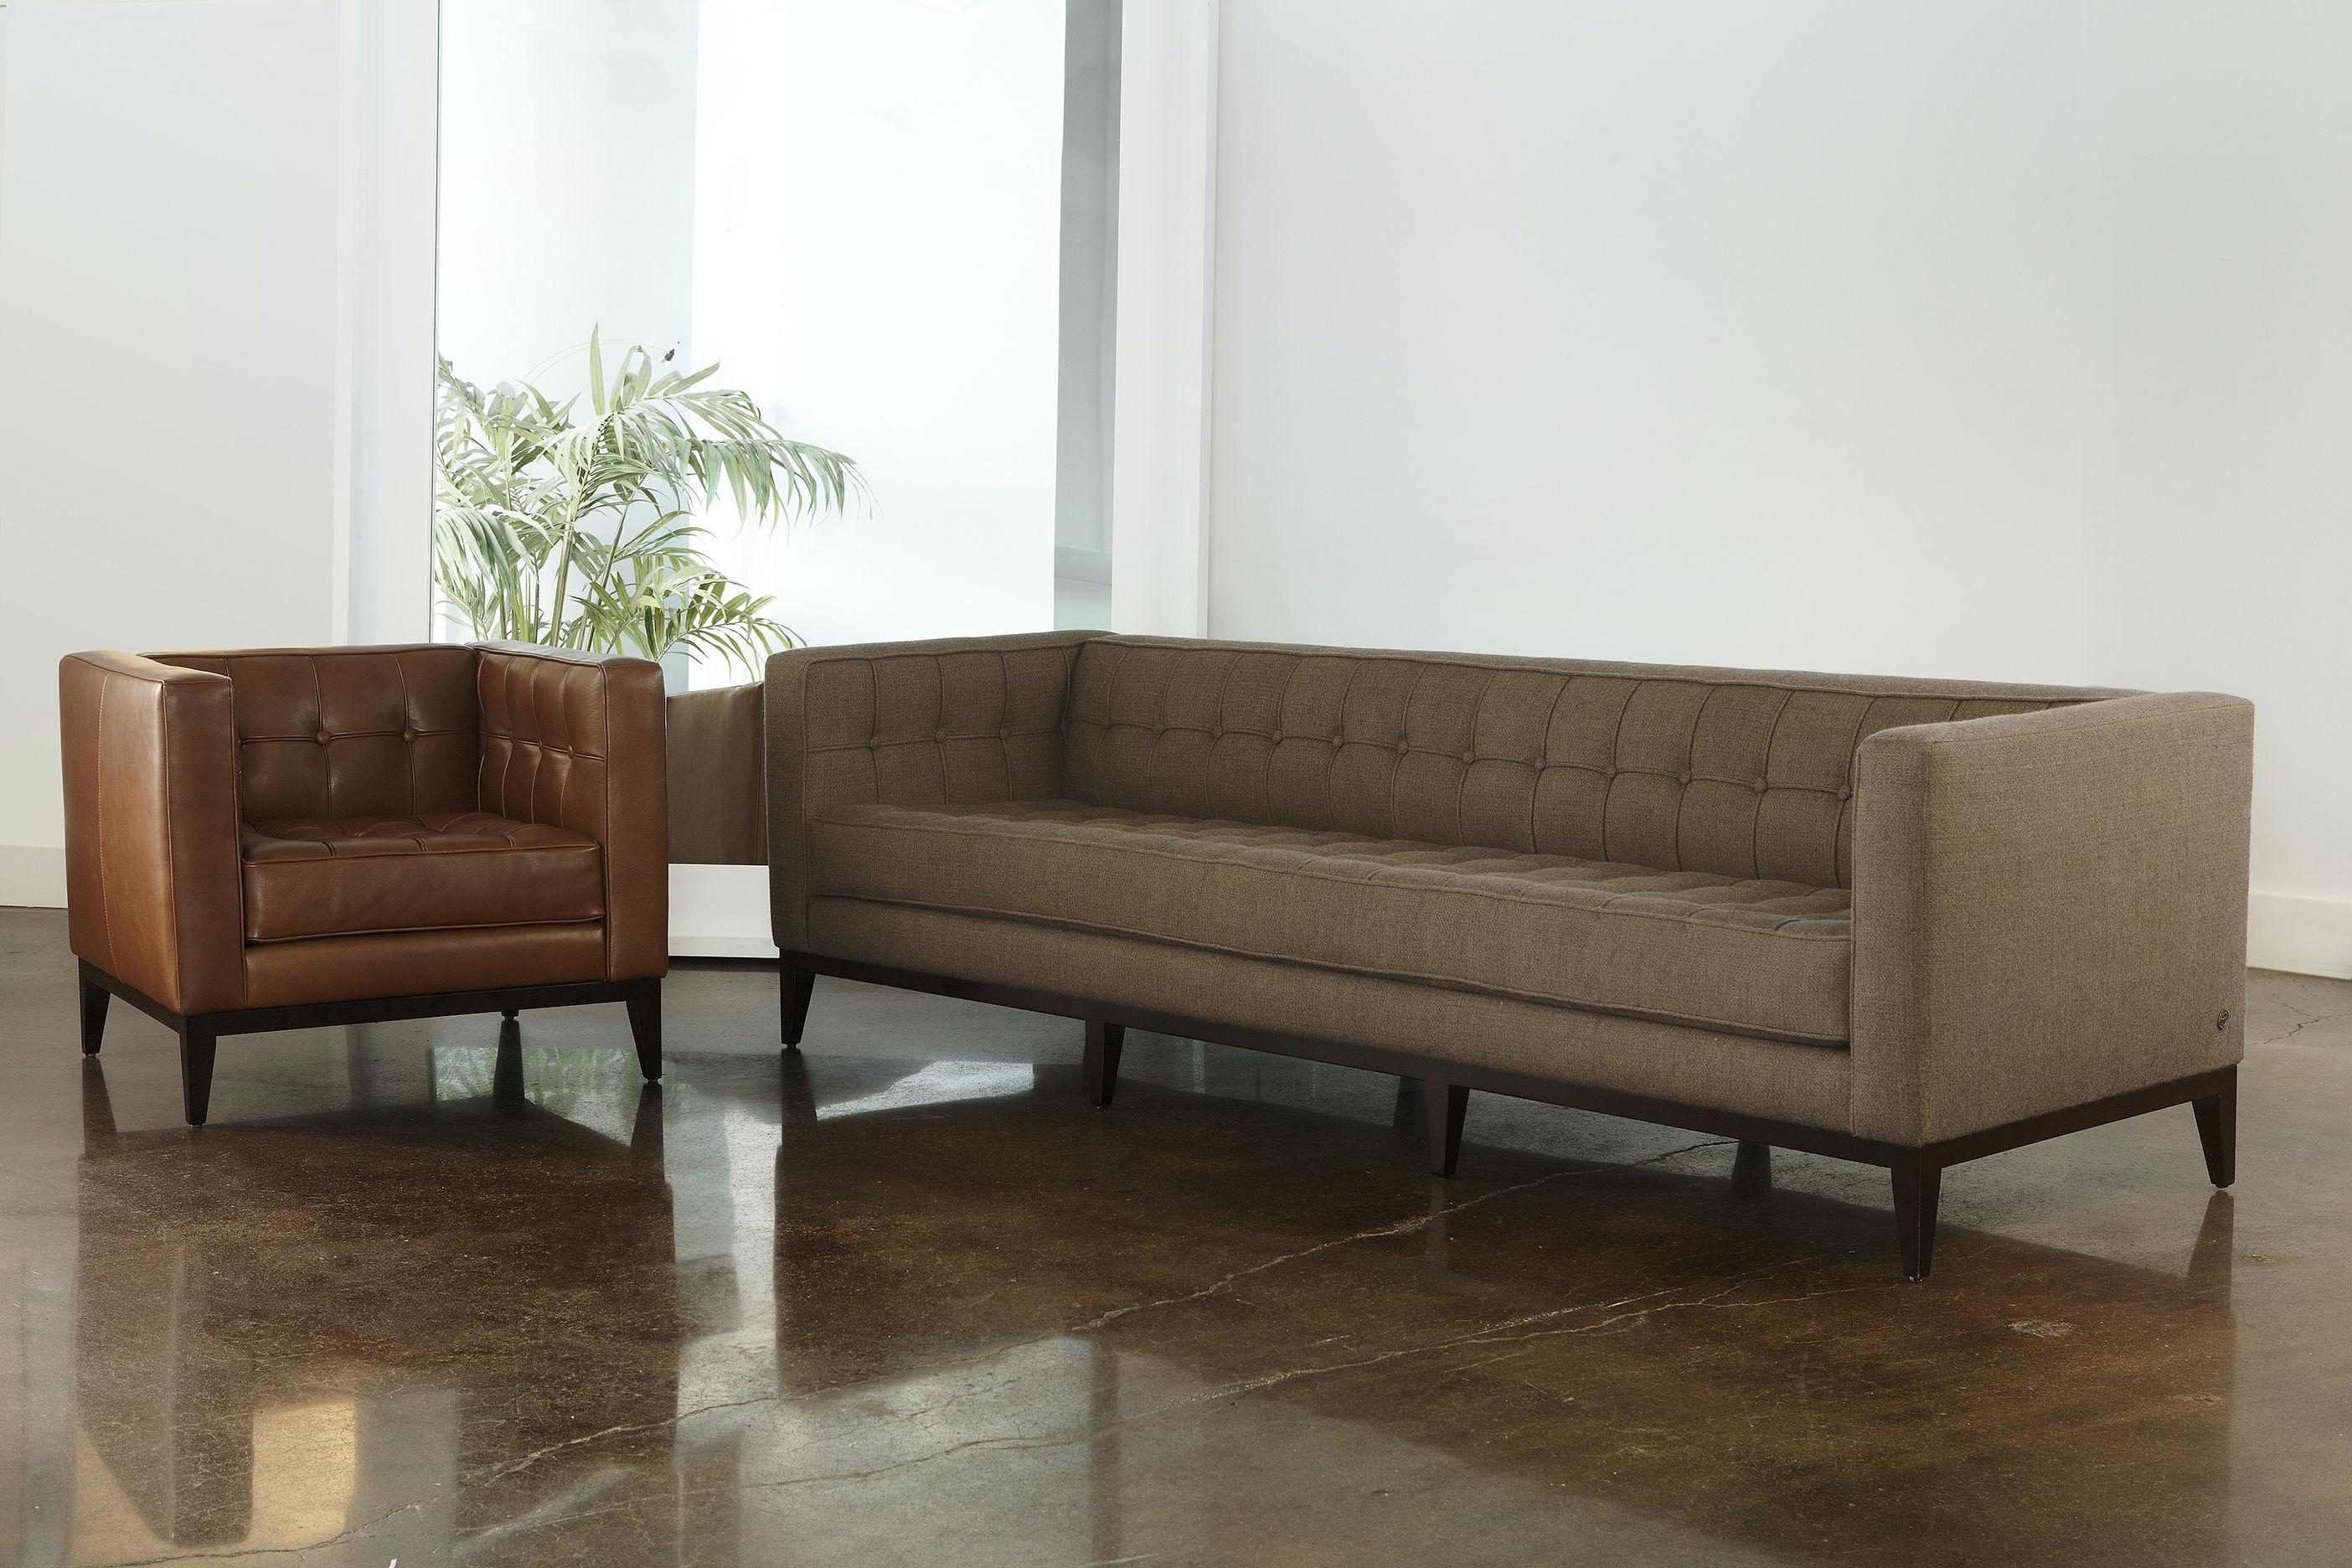 American Leather One Cushion Sofa LUX SO2 LG